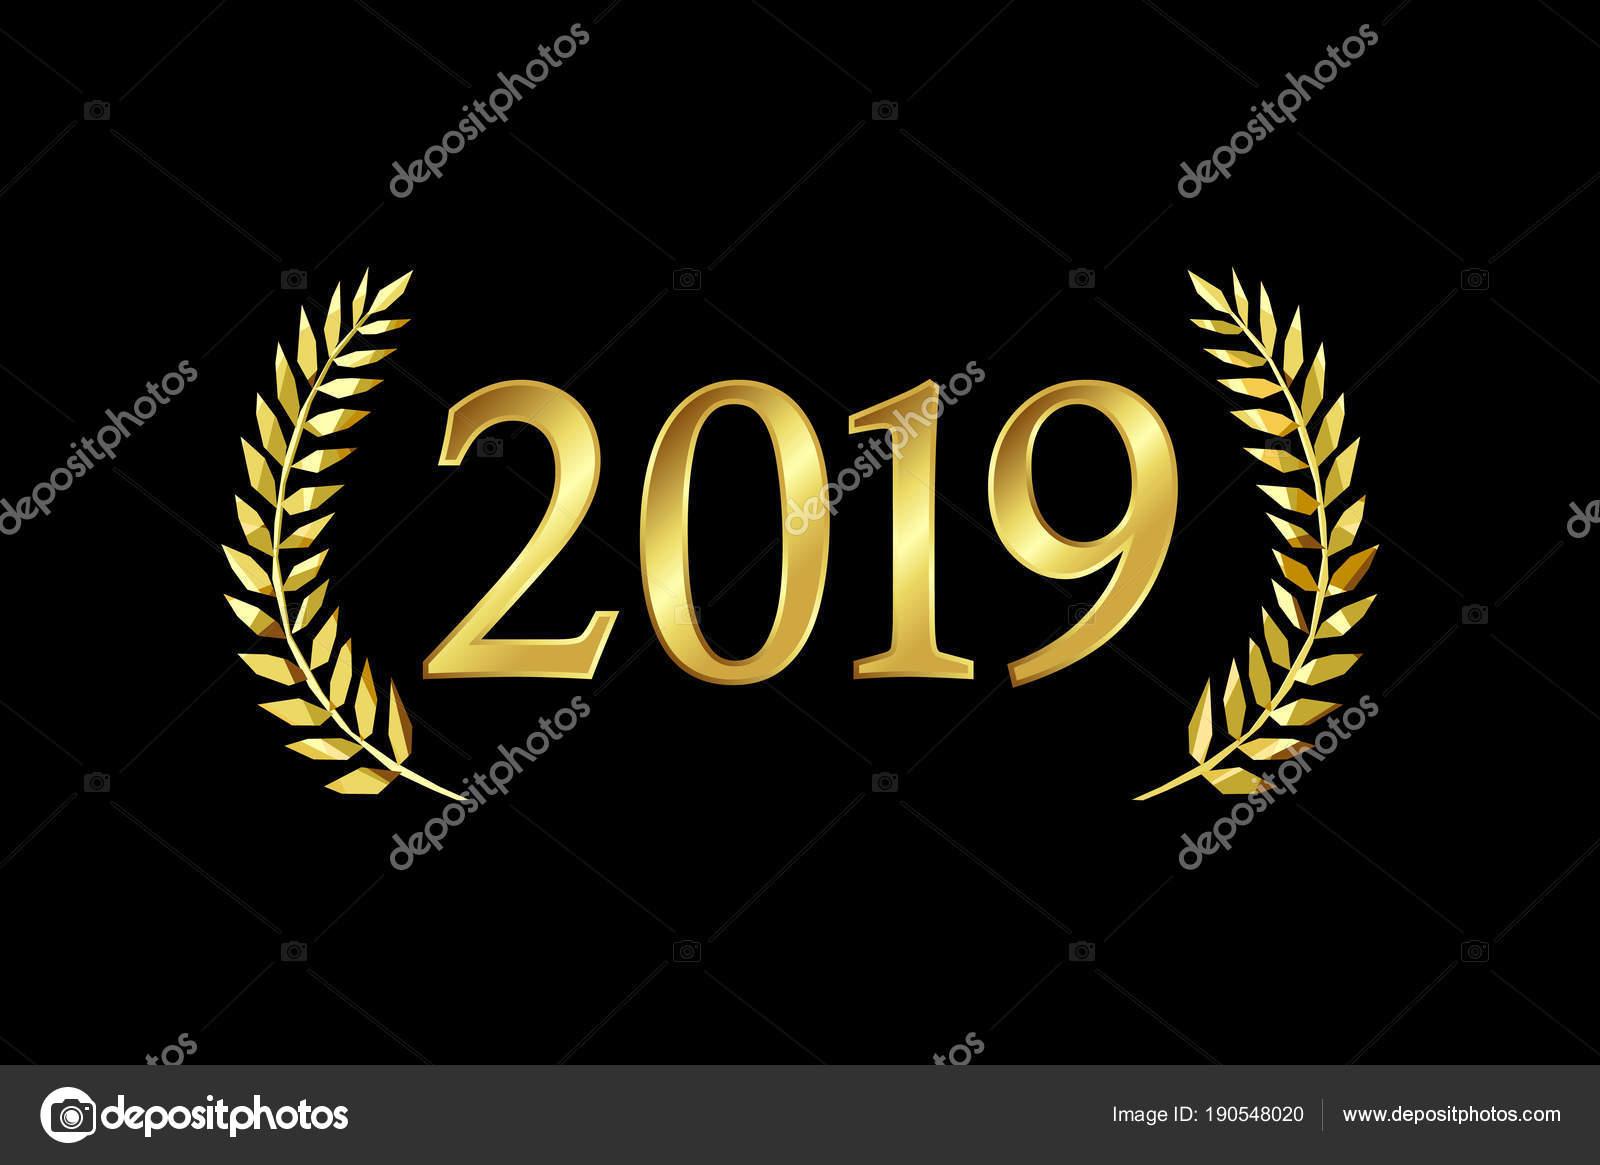 2019 Happy New Year Merry Xmas Greetings Palms Framed